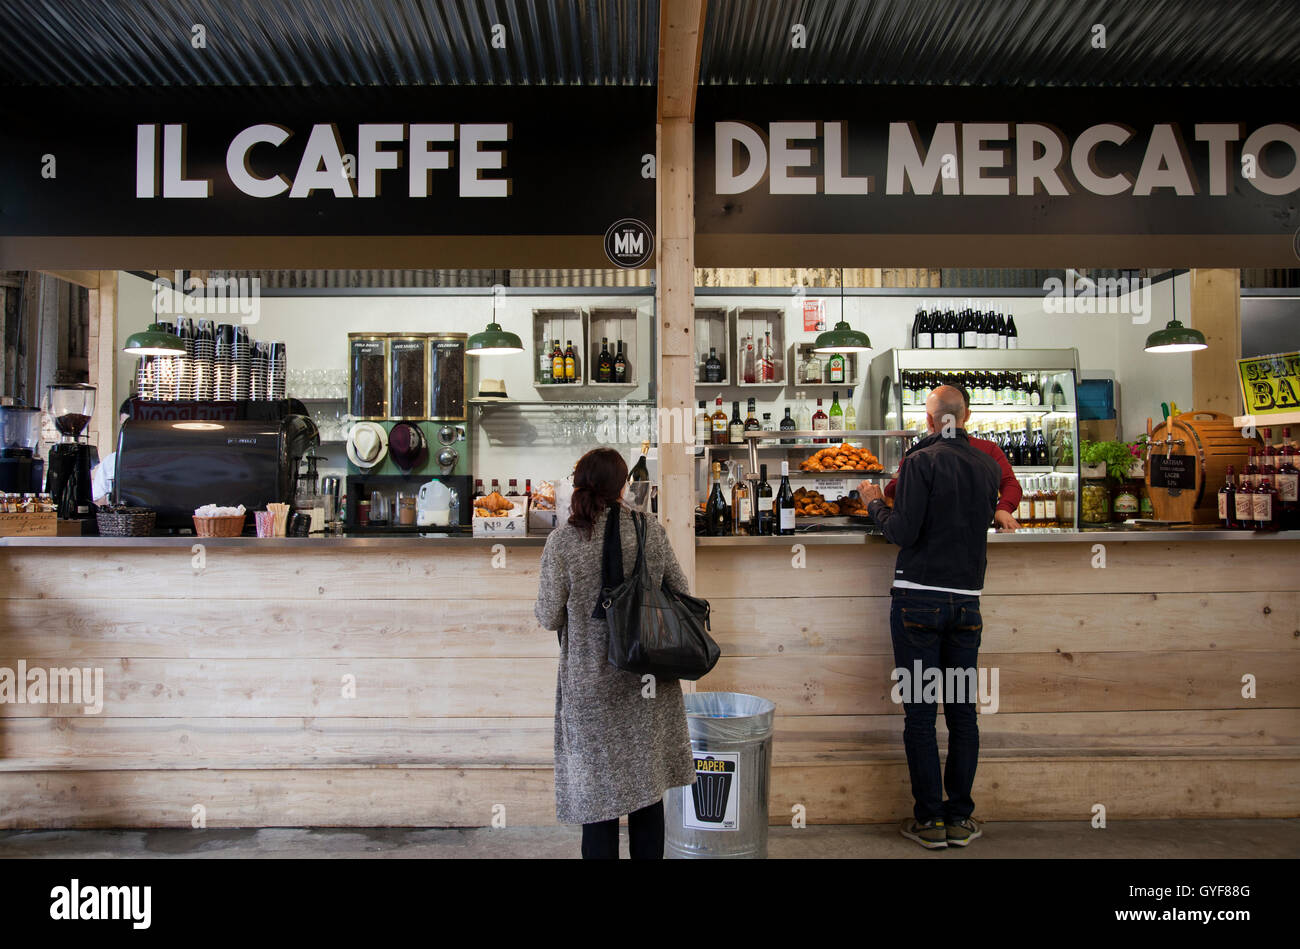 Mercato Metropolitano Italian Farmers Market on Newington Causeway in SE1 - London UK - Stock Image